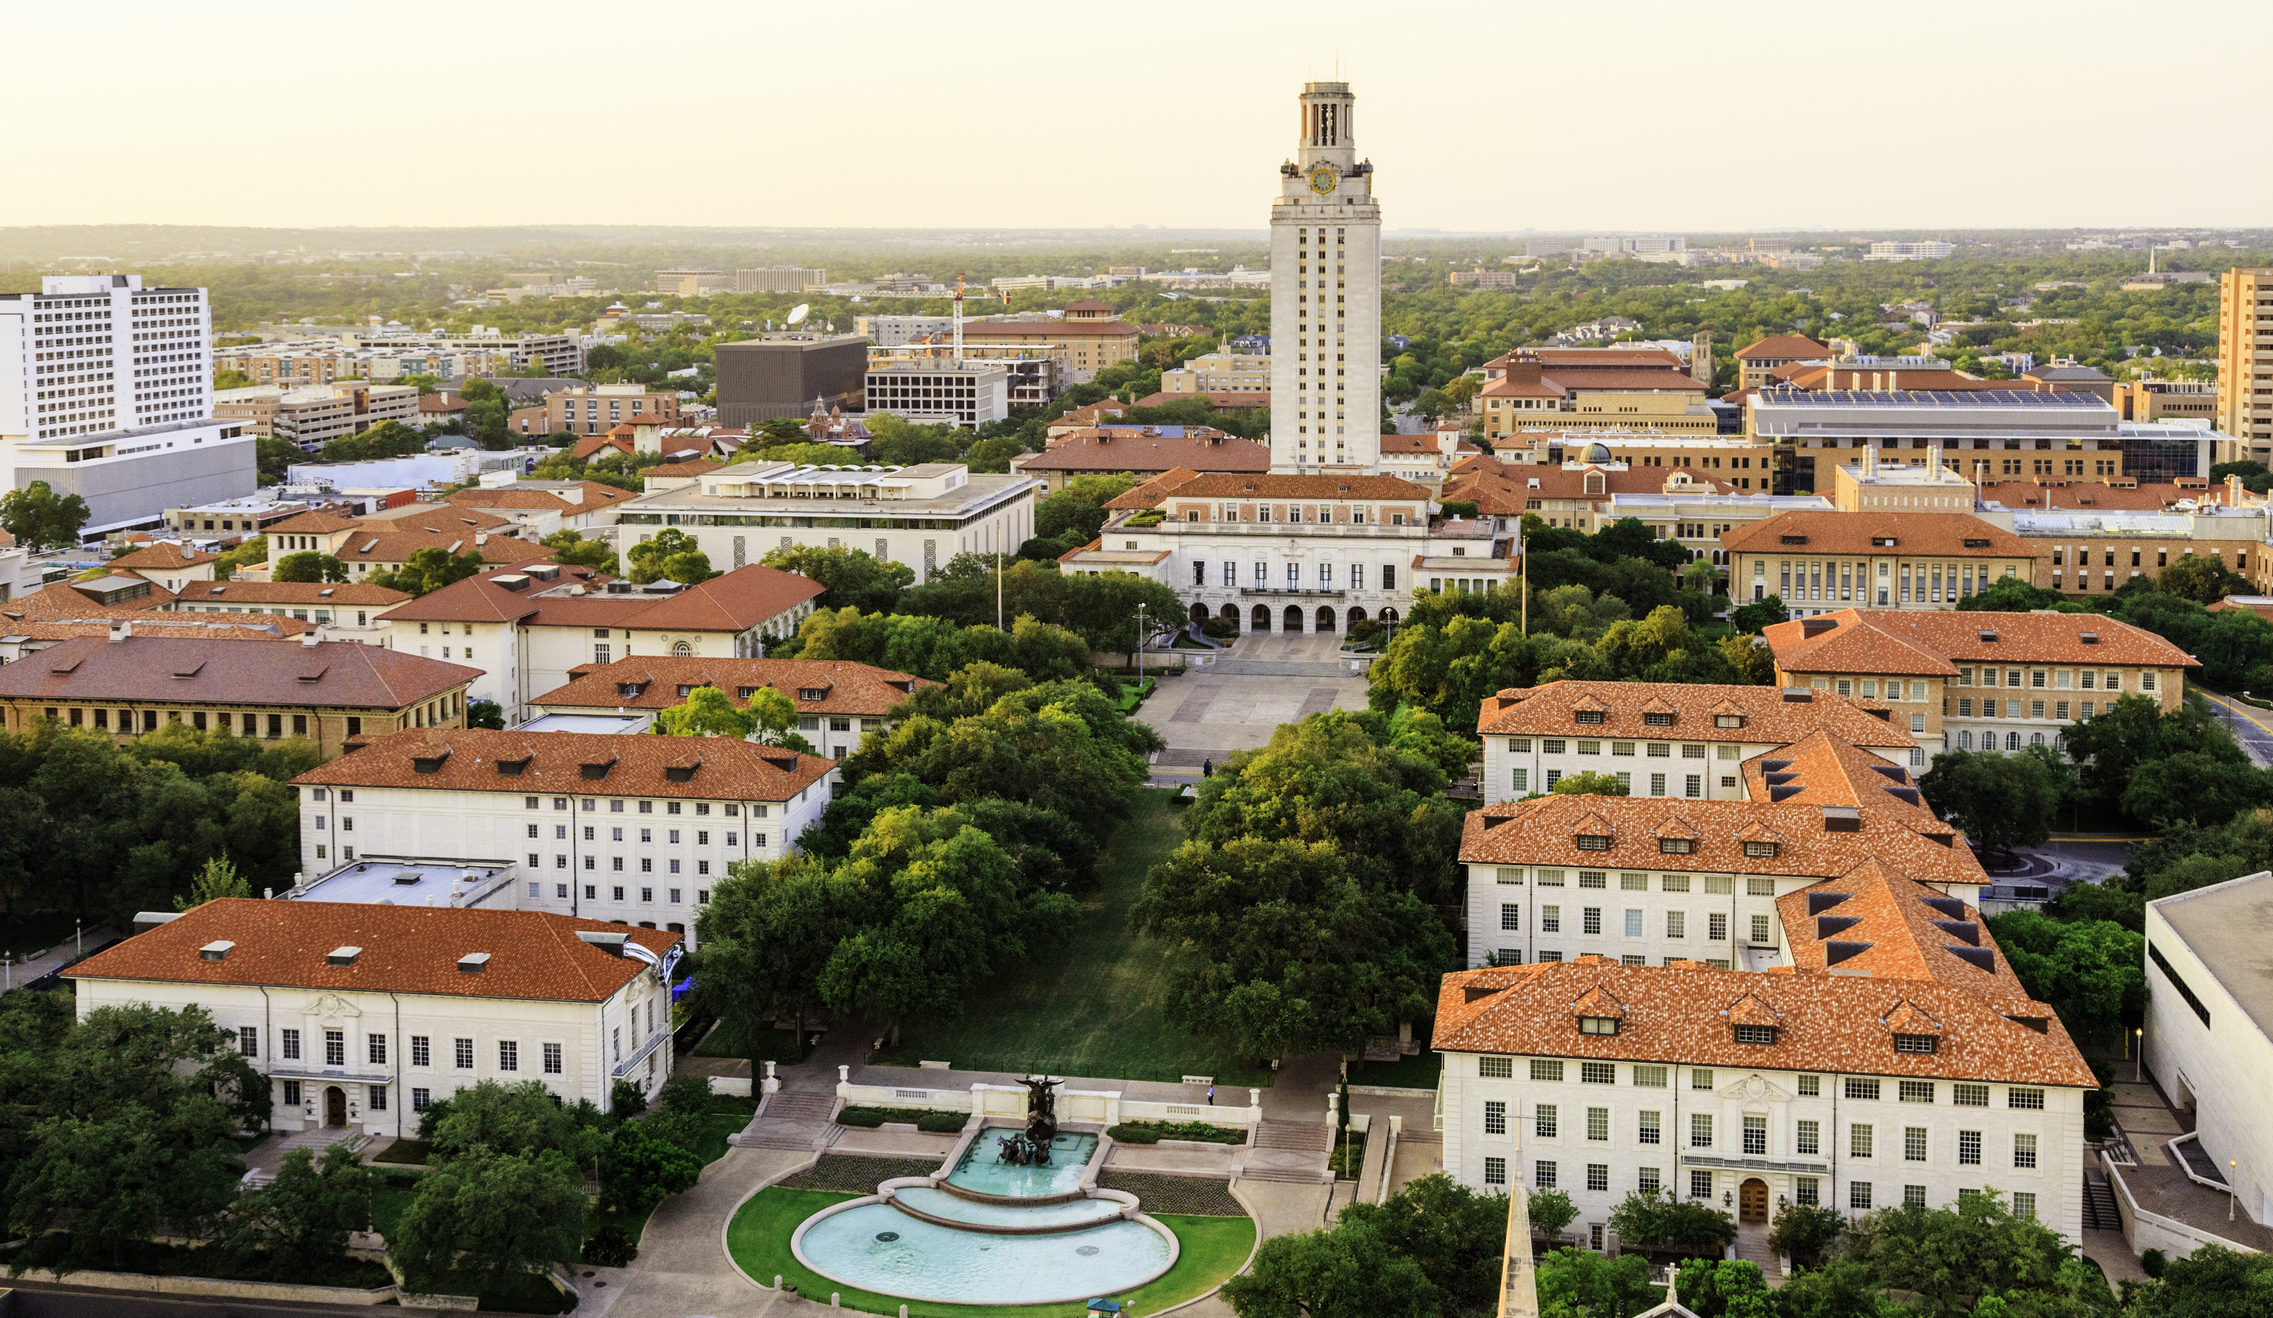 University of Texas-Austin campus